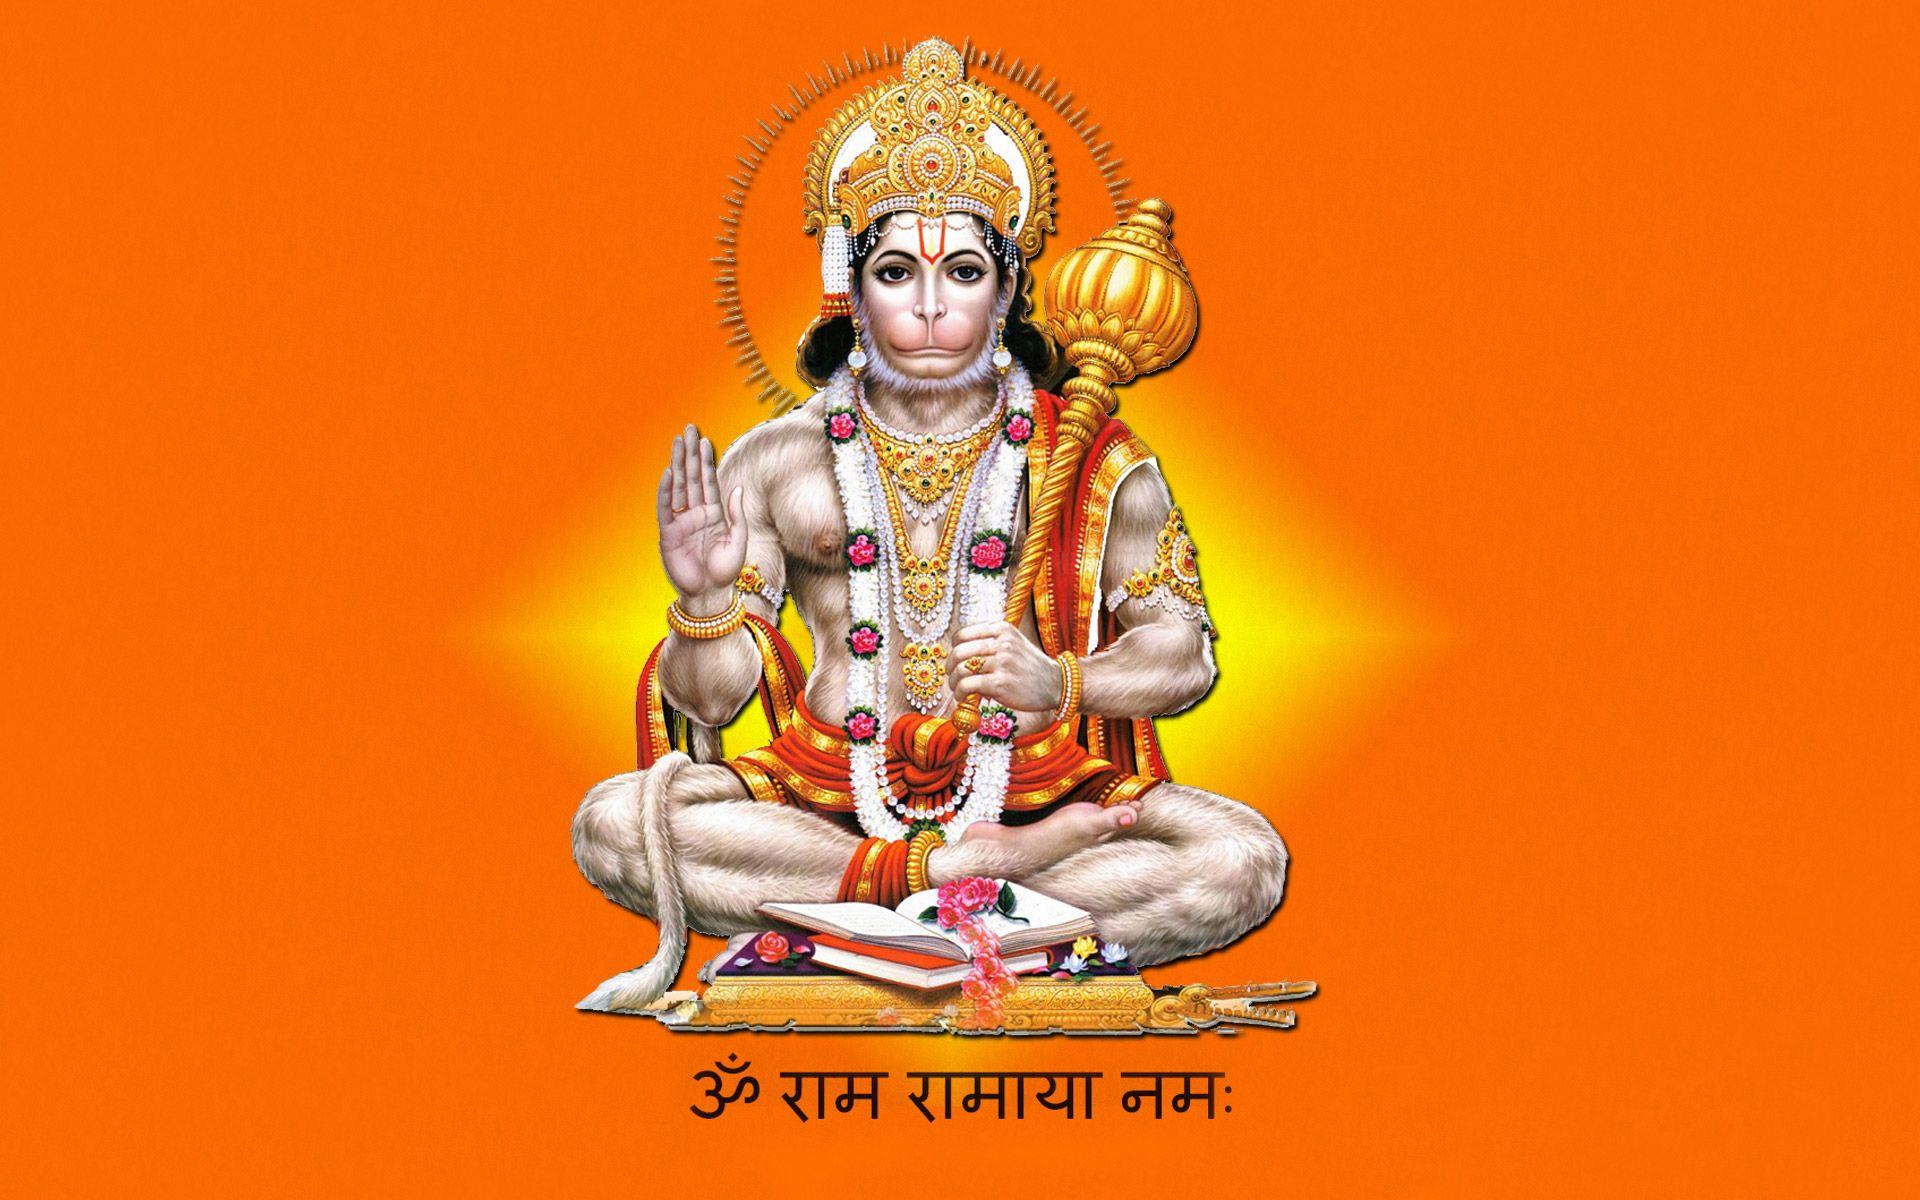 Hd wallpaper hanuman - Lord Hanuman Wallpaper 20 Best Games Wallpapers Pinterest Hanuman And Wallpaper